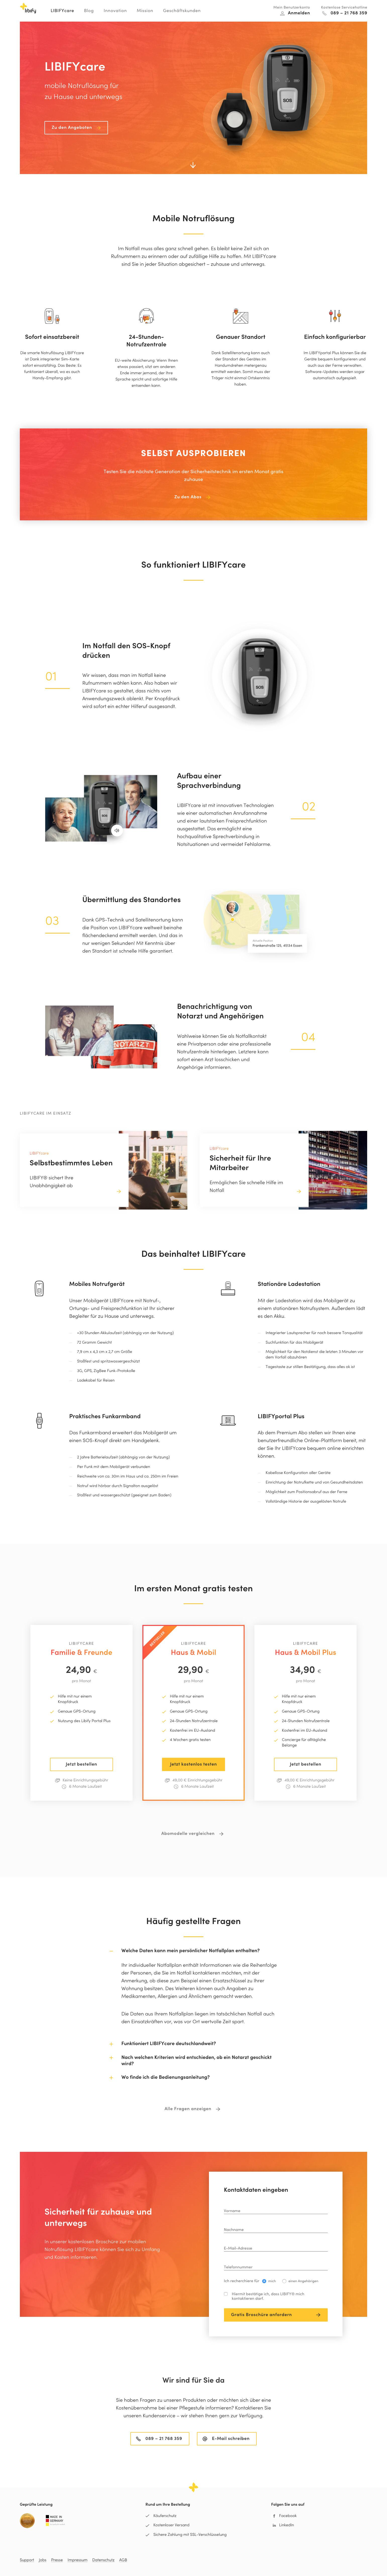 DavidStreit-Libify-Product